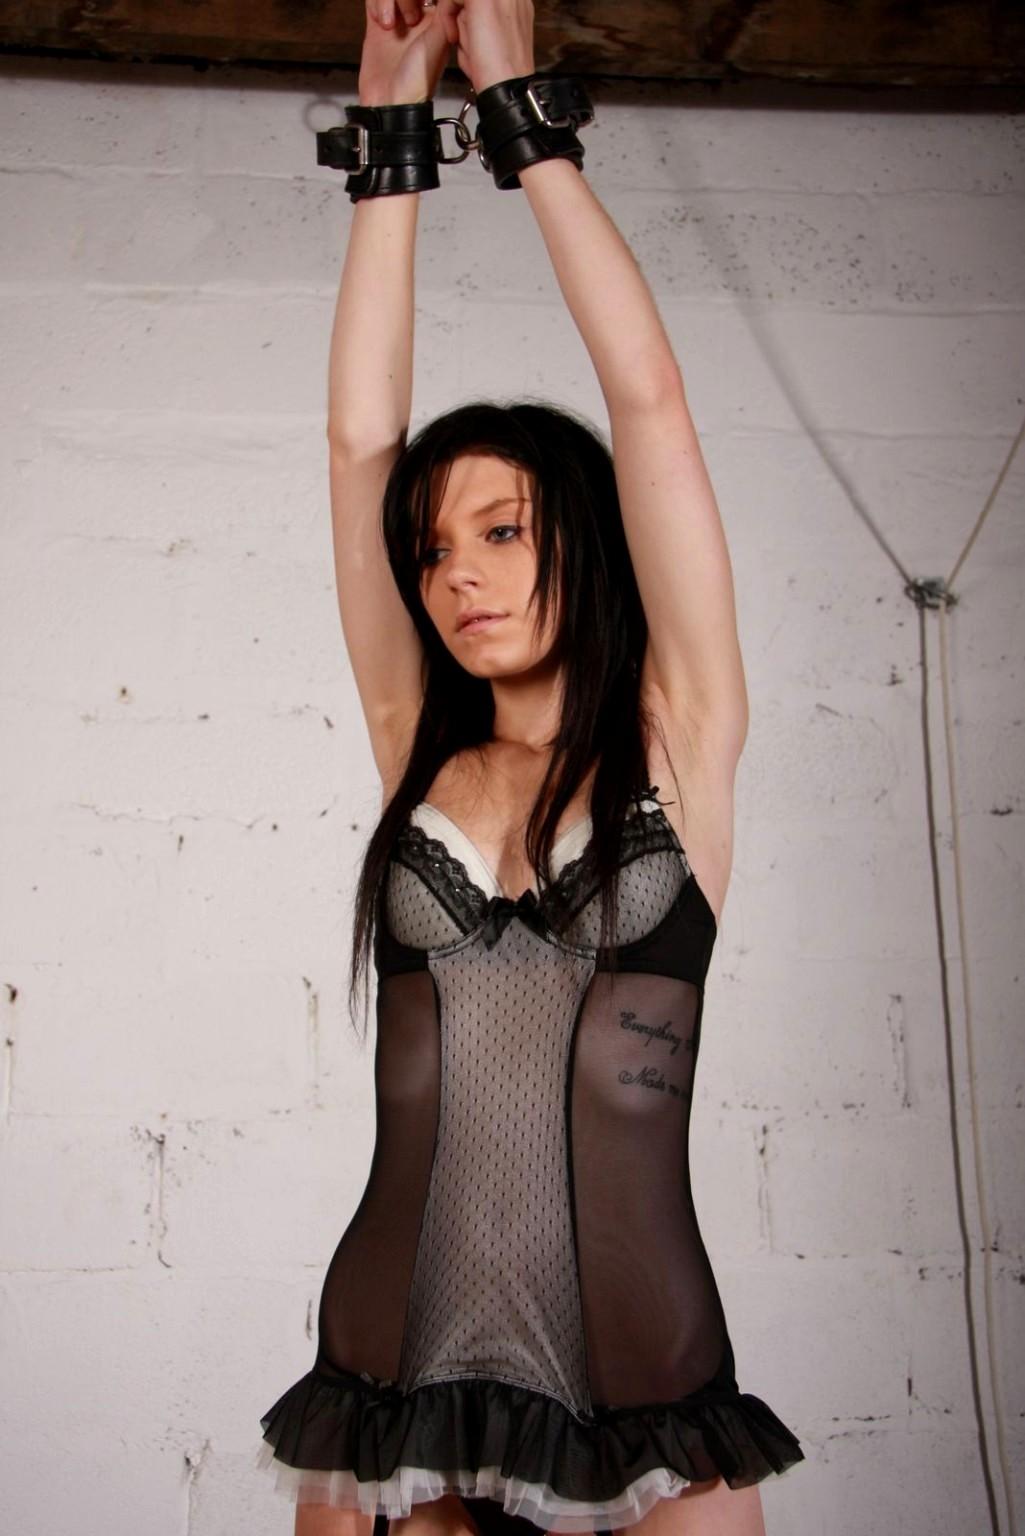 Babe bound in steel restraints vibed